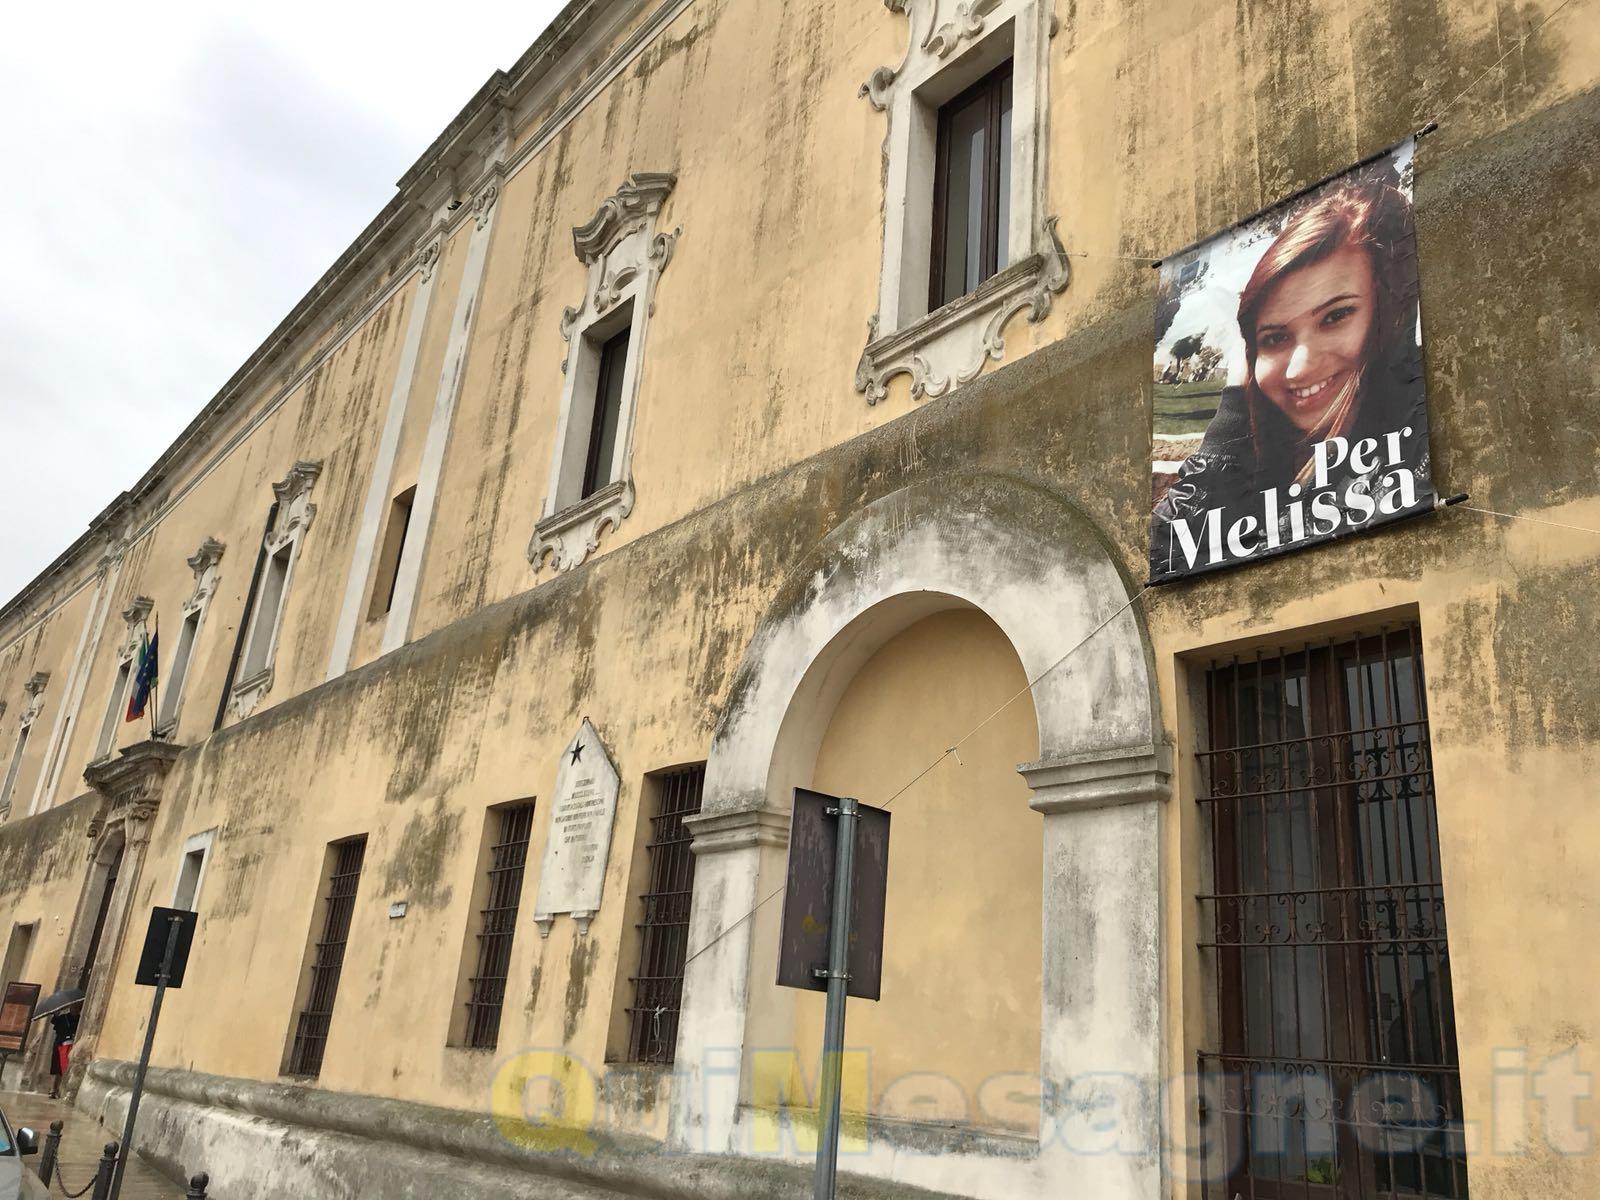 19 Maggio, Ricordando Melissa